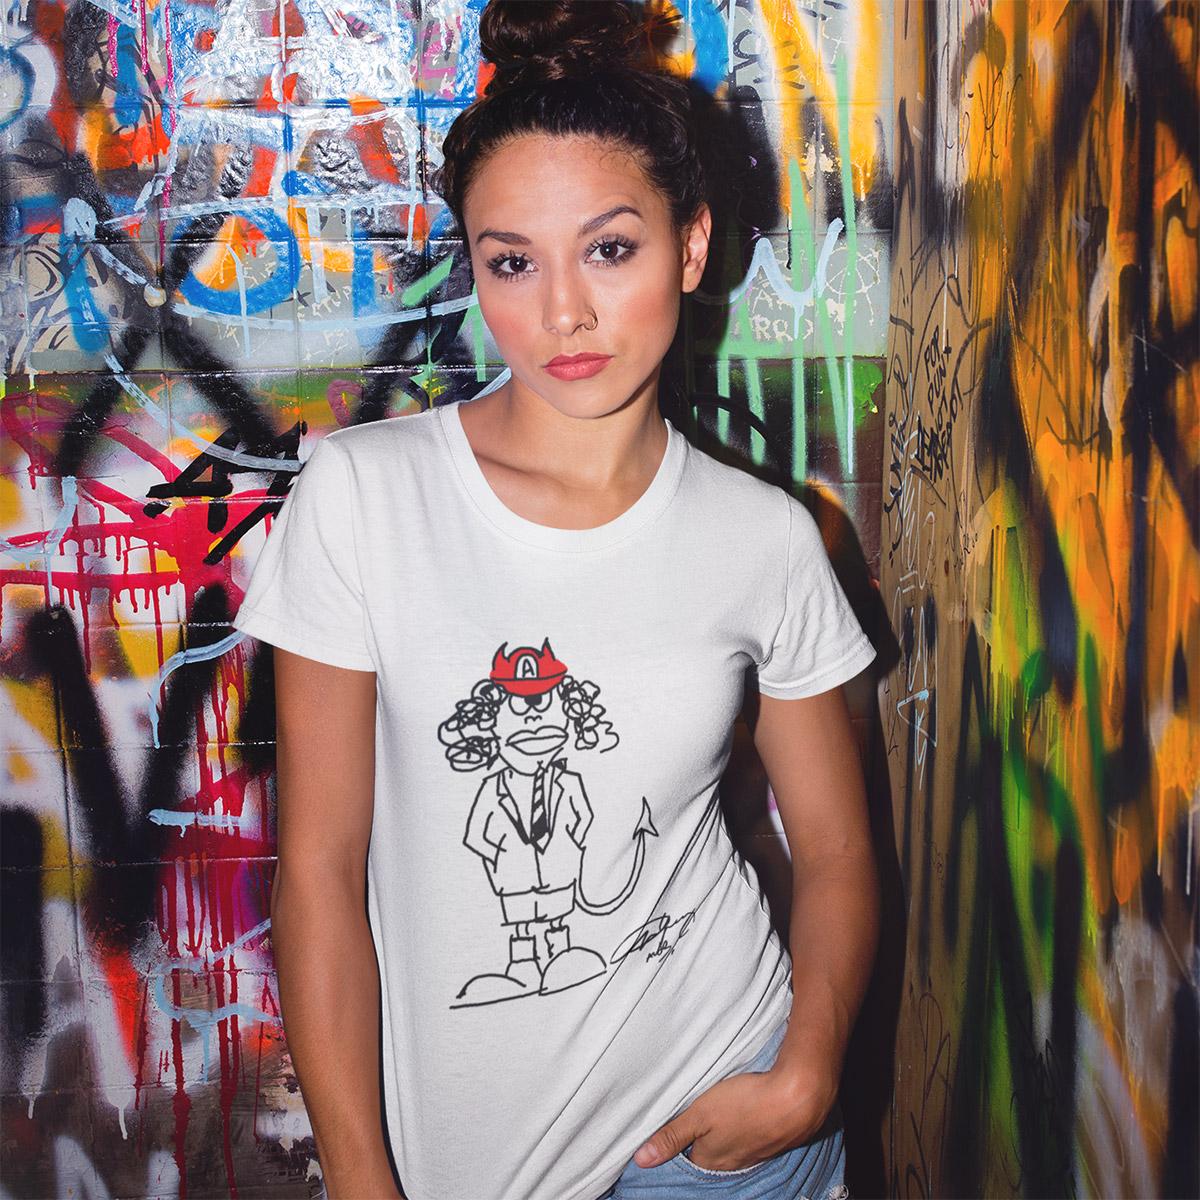 Angus Signature Cartoon Ladies Fitted T-shirt